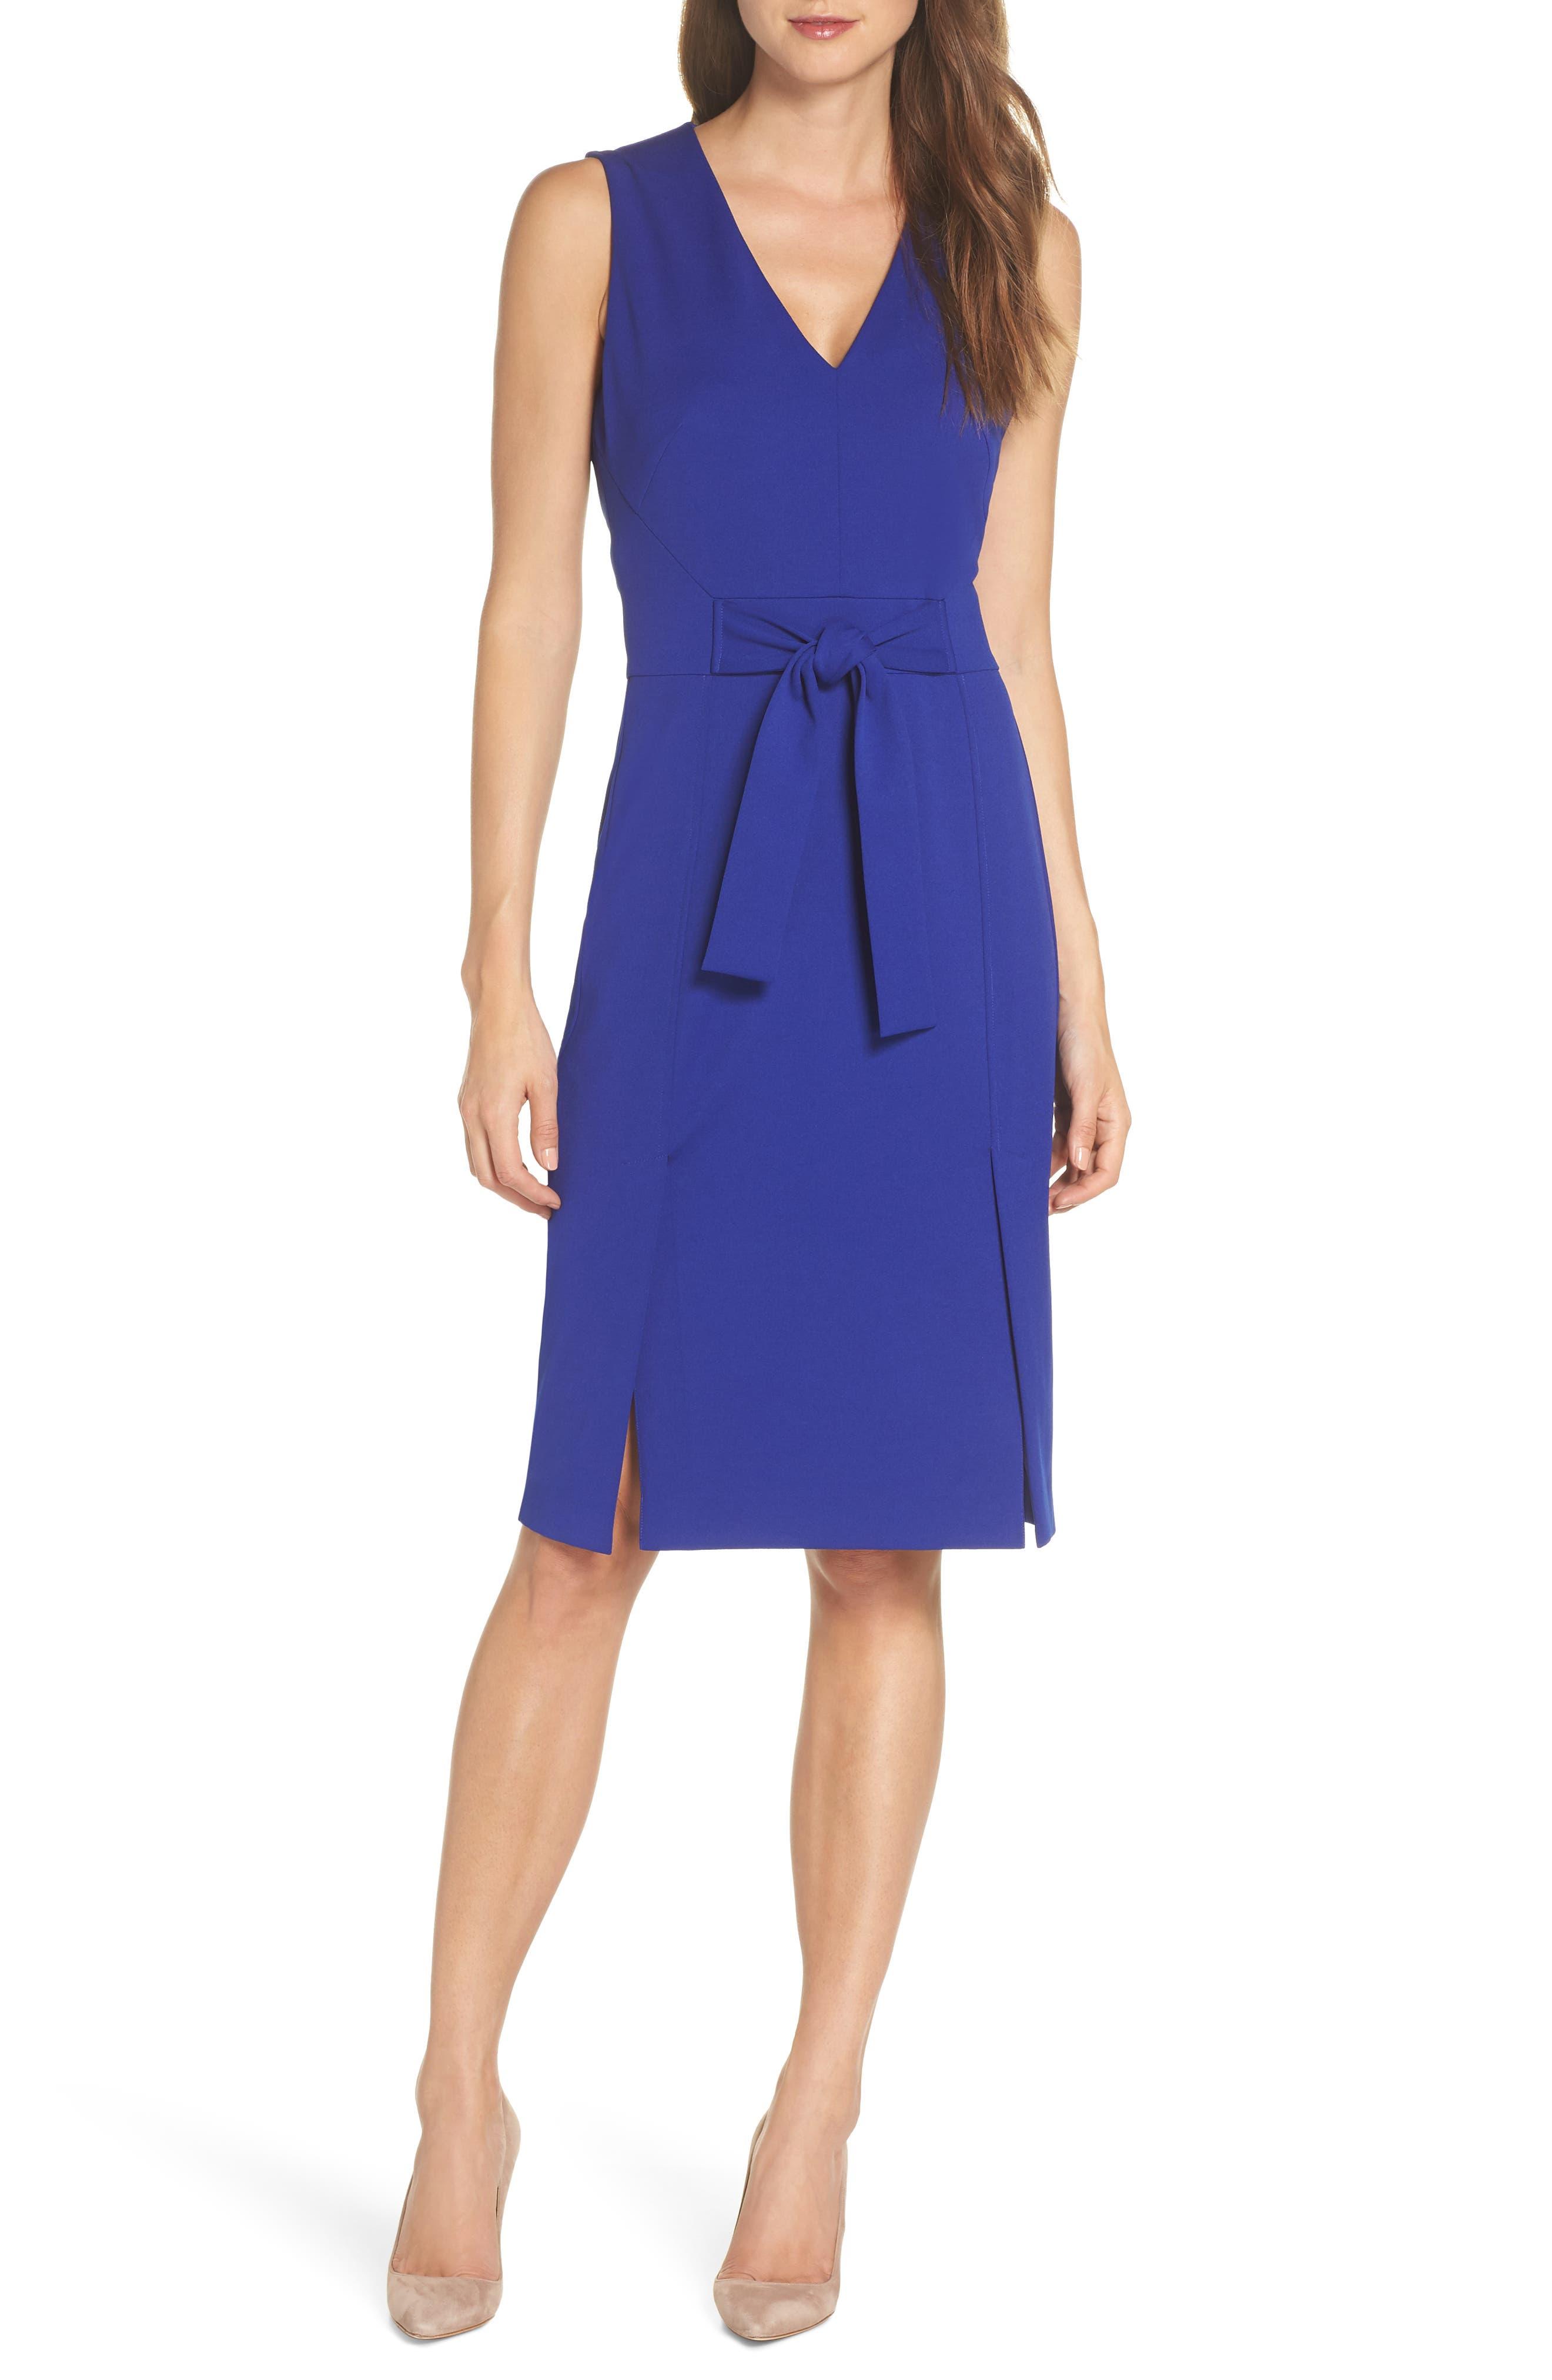 VINCE CAMUTO Scuba Crepe Sheath Dress, Main, color, COBALT